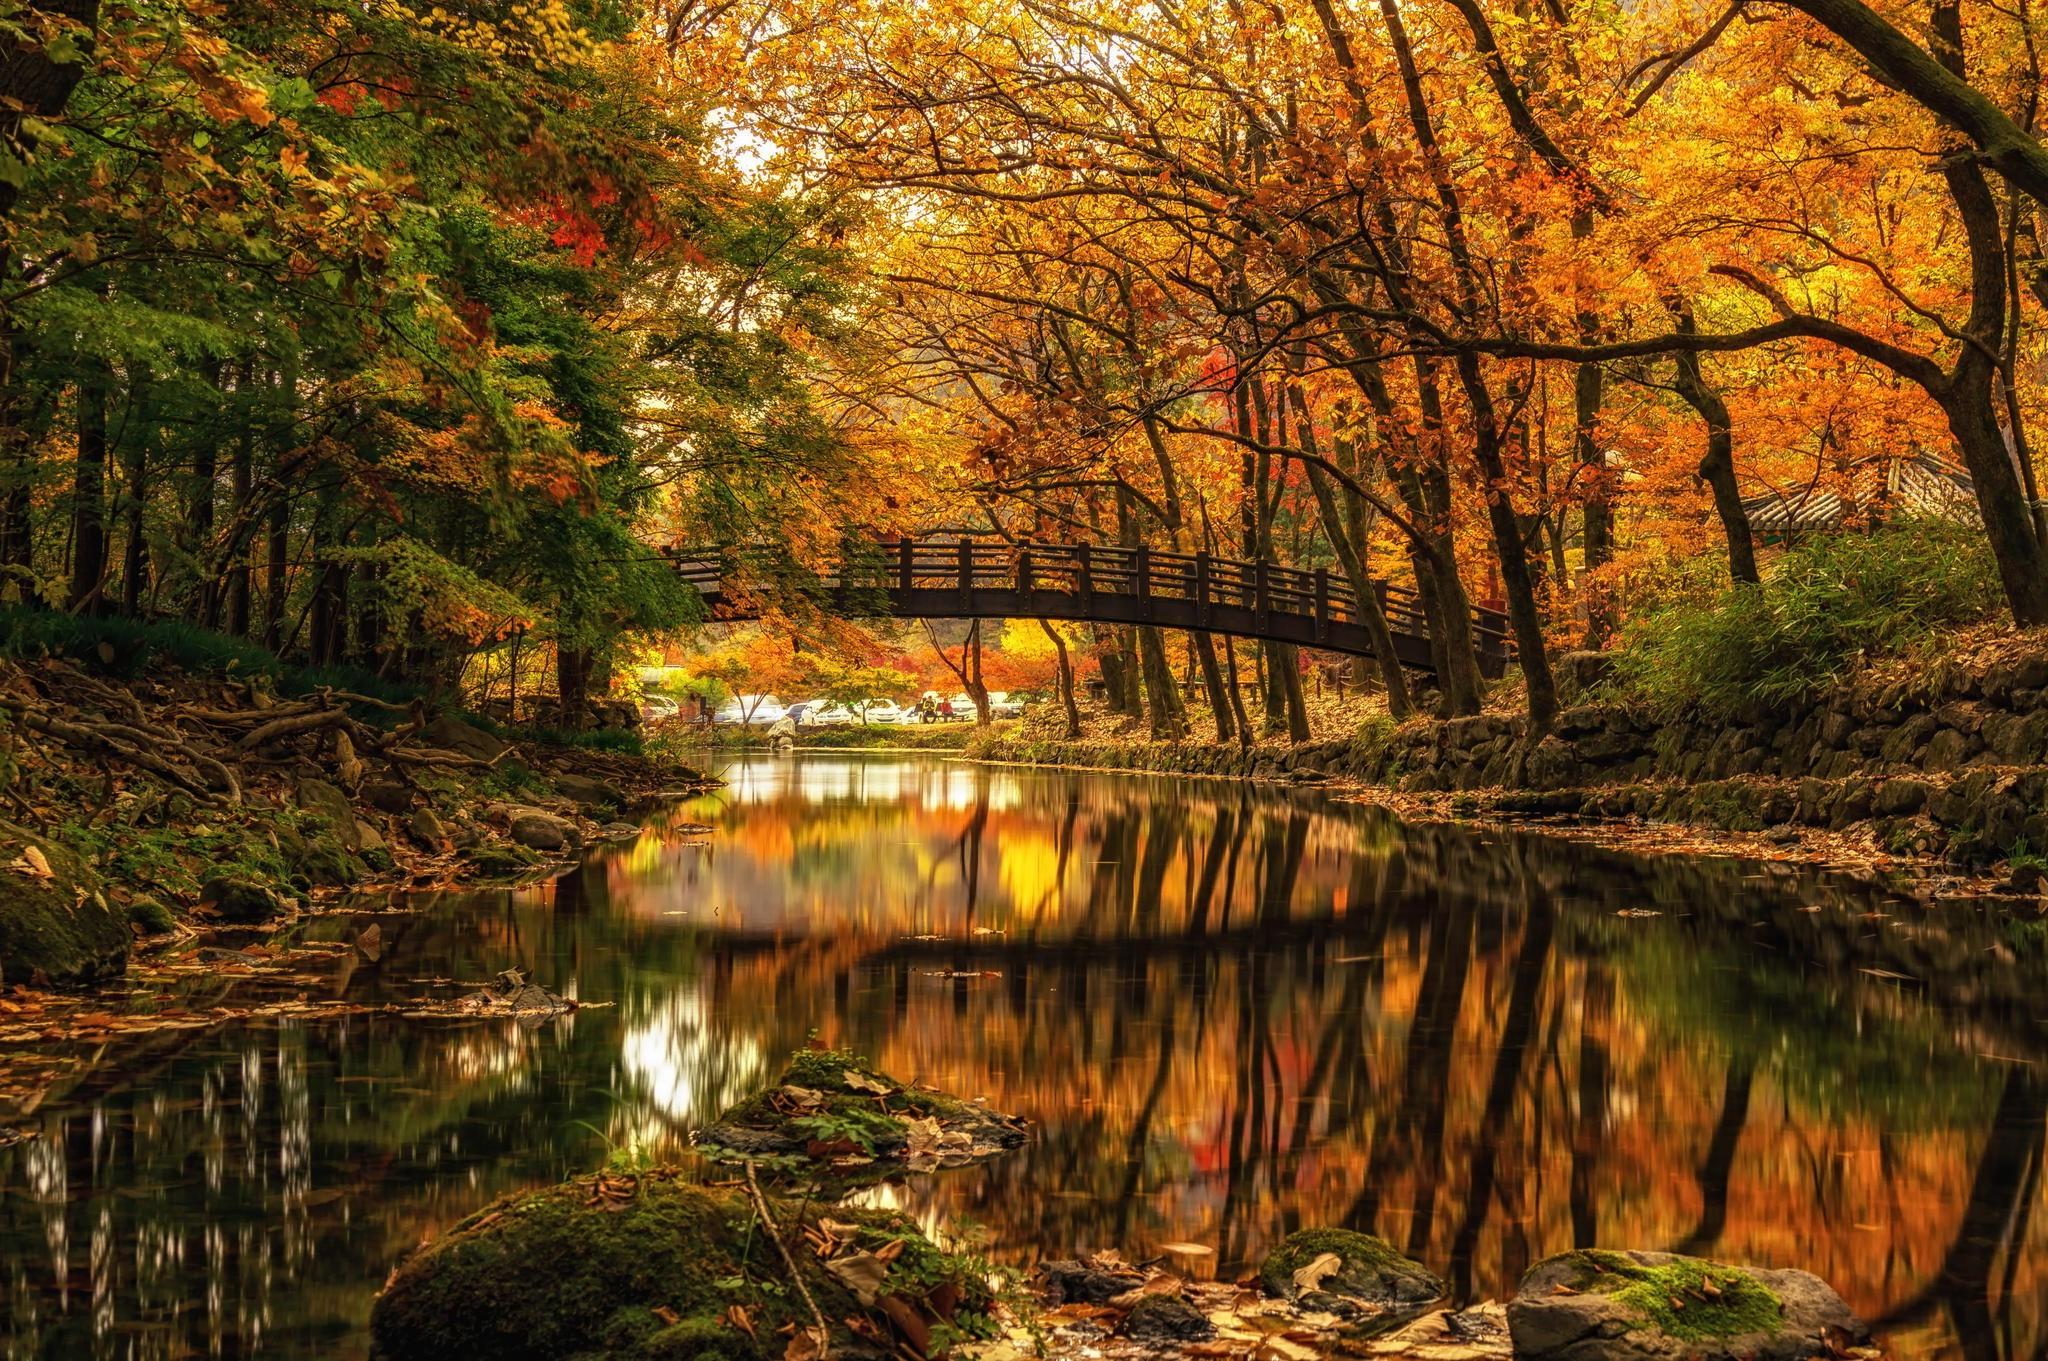 Fall Halloween Computer Wallpaper Nature Landscape Water Trees Forest River Bridge